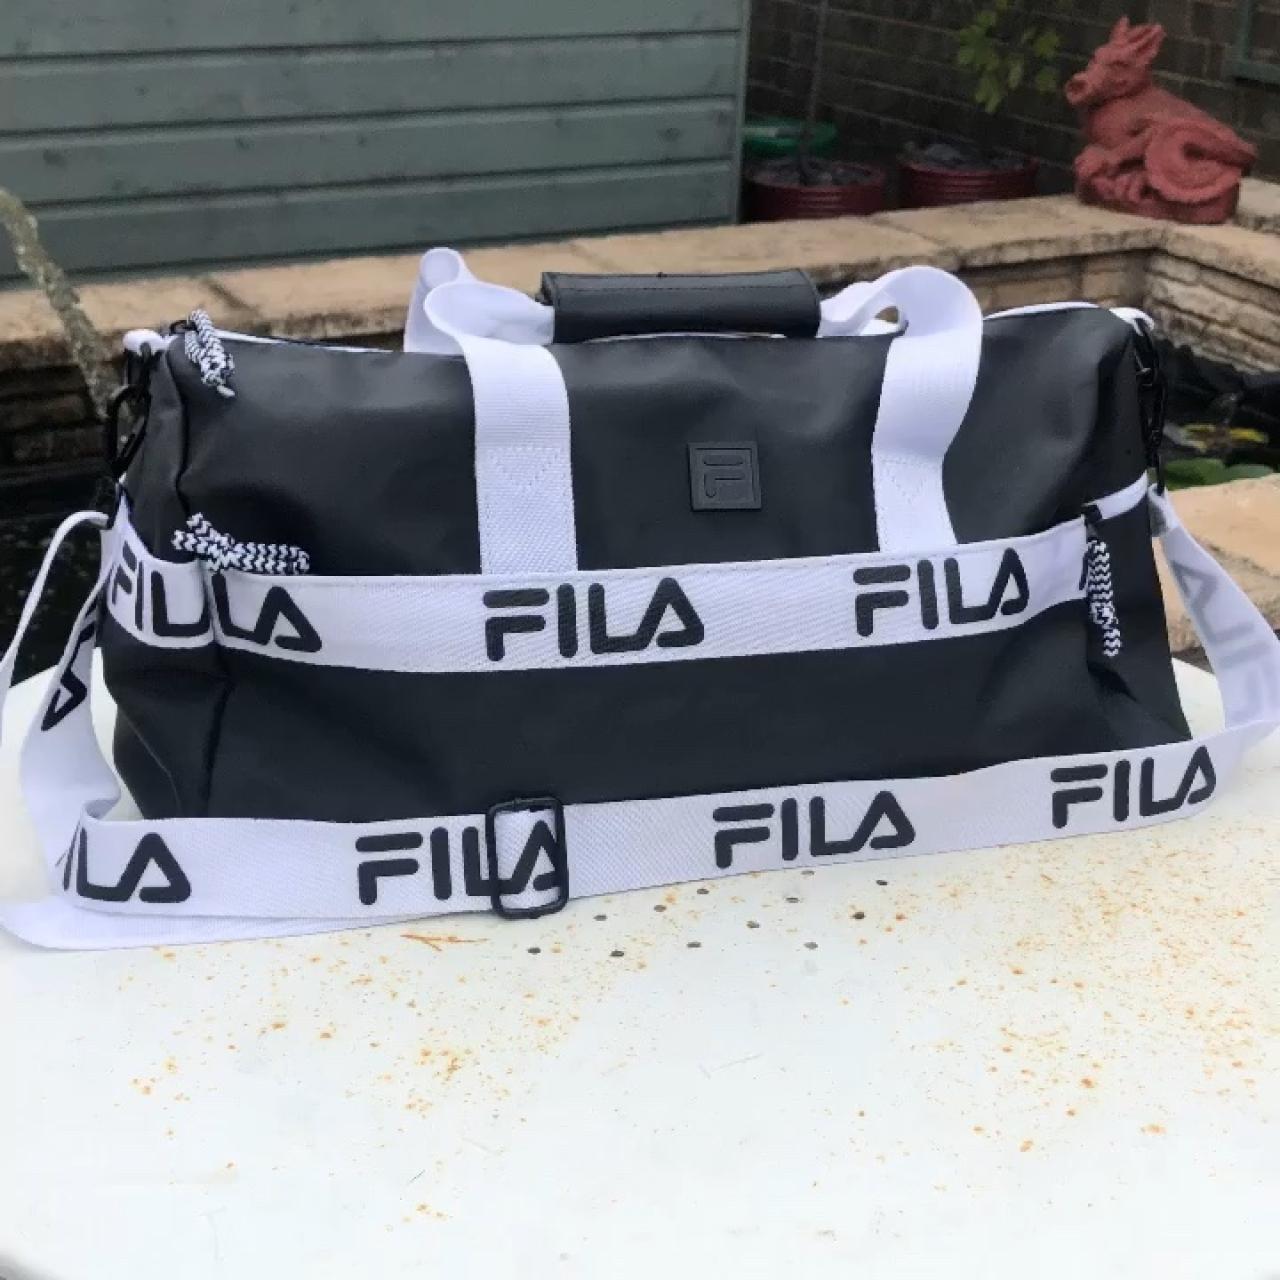 Vintage Grail Fila Major Striped Duffle Bag strap with clip - Depop 9c696cd969cdb